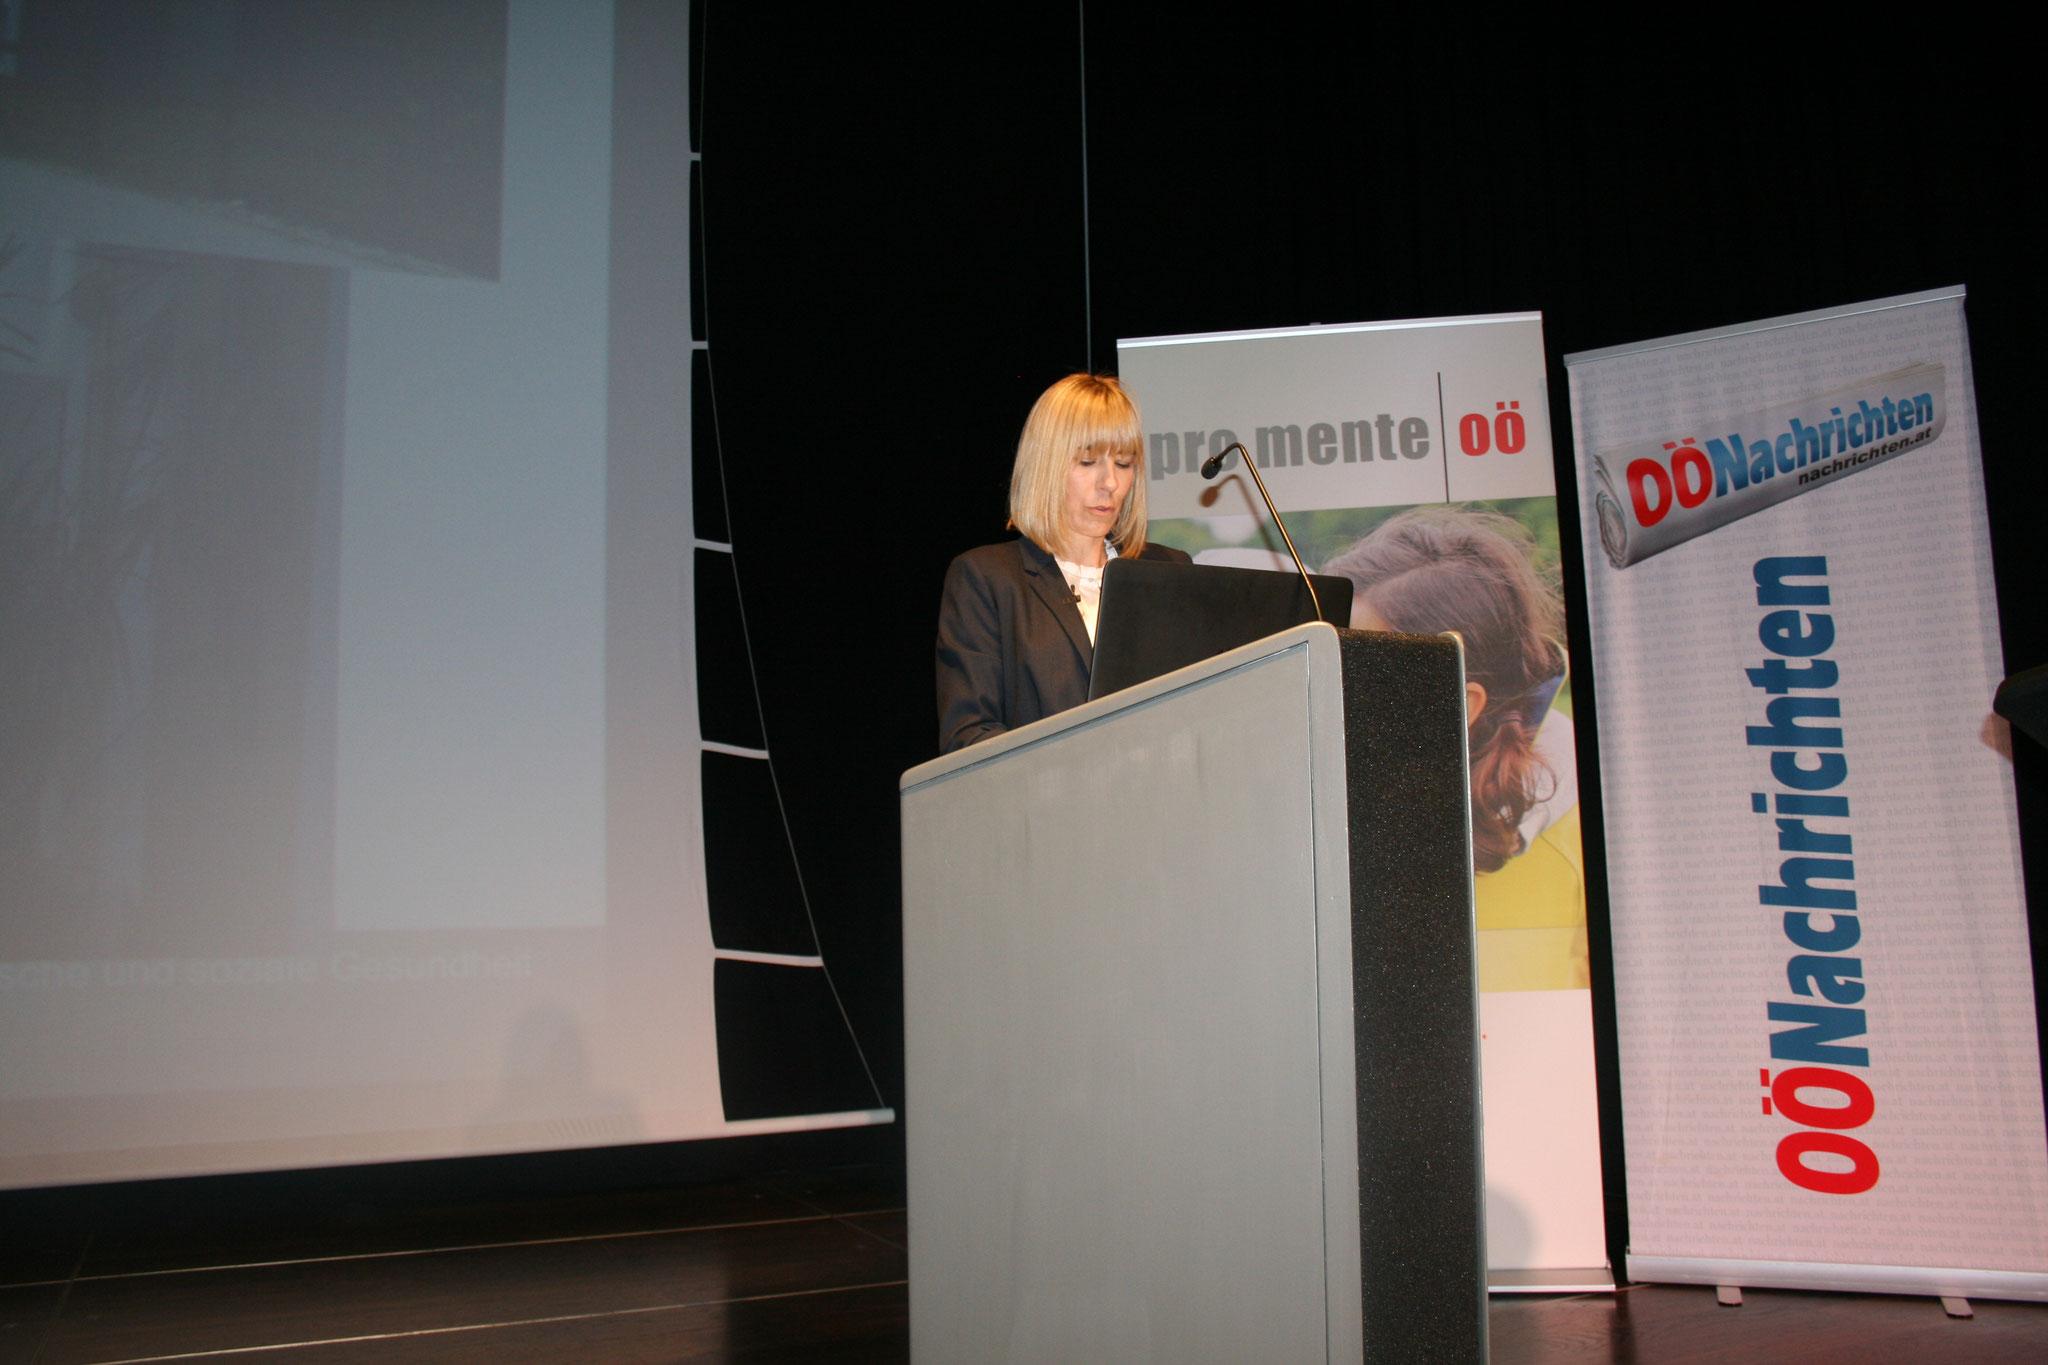 Bettina Neumayer